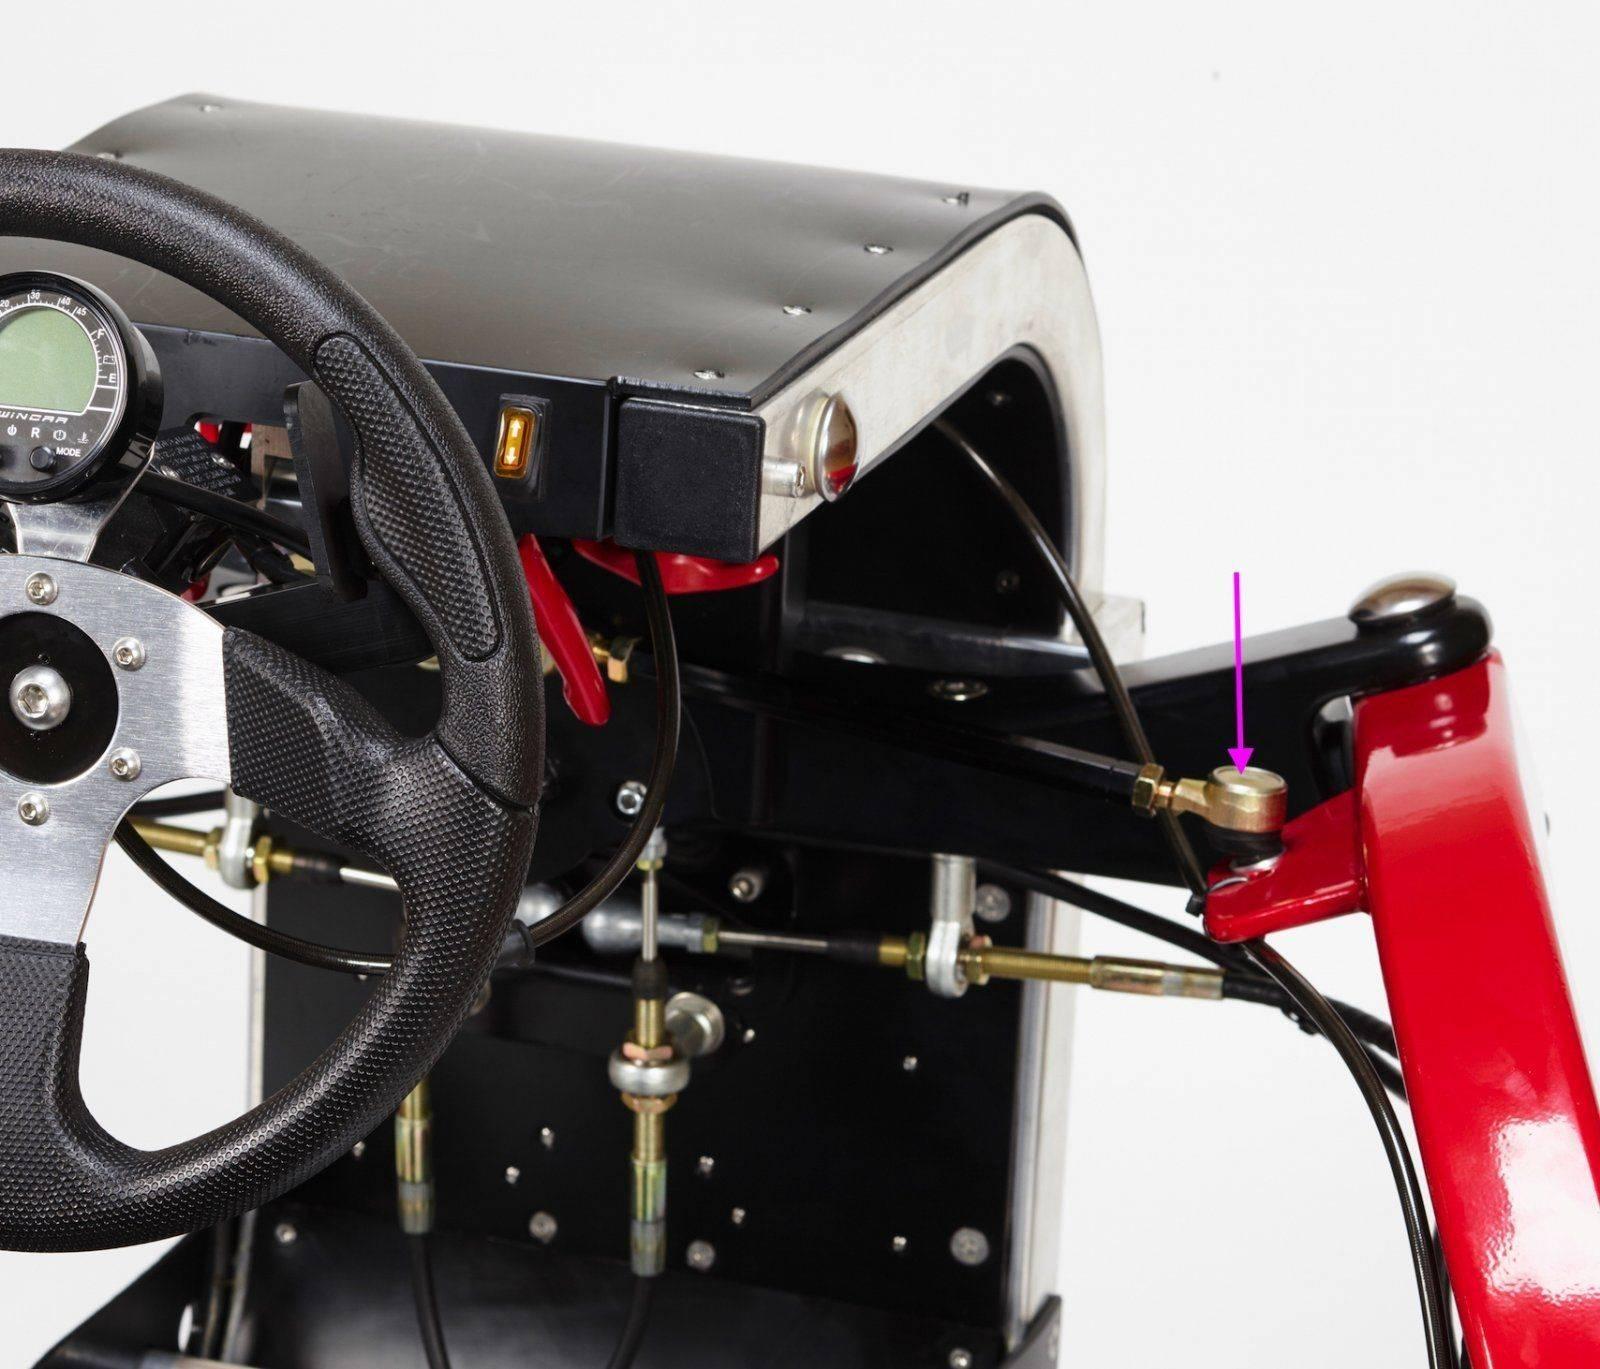 The-Swincar-E-Spider-static-steering-HIGH-RES.jpg